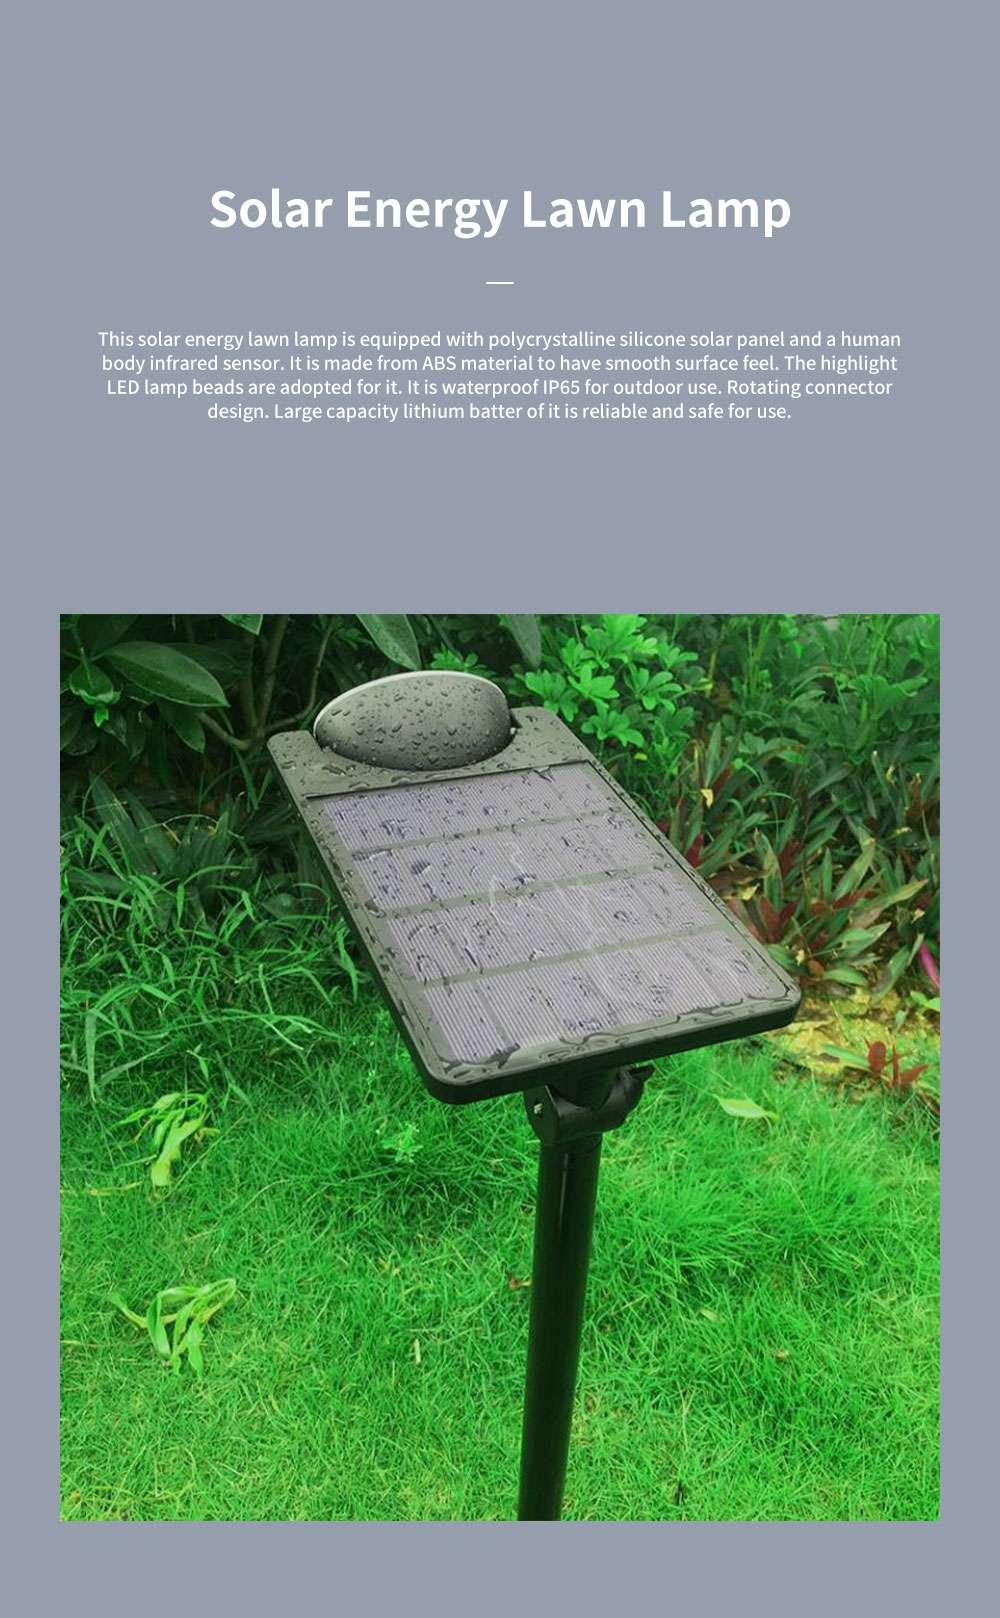 Solar Energy Ultra Thin Wall Lamp for Lawn Lighting Decoration Body Sensing Flat Panel Lawn Light Ultrathin Waterproof Lawn Lamp 0